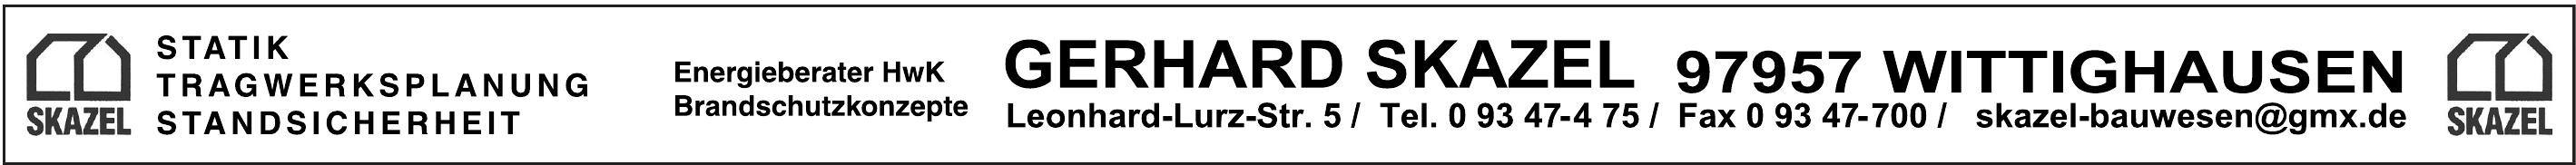 Gerhard Skazel